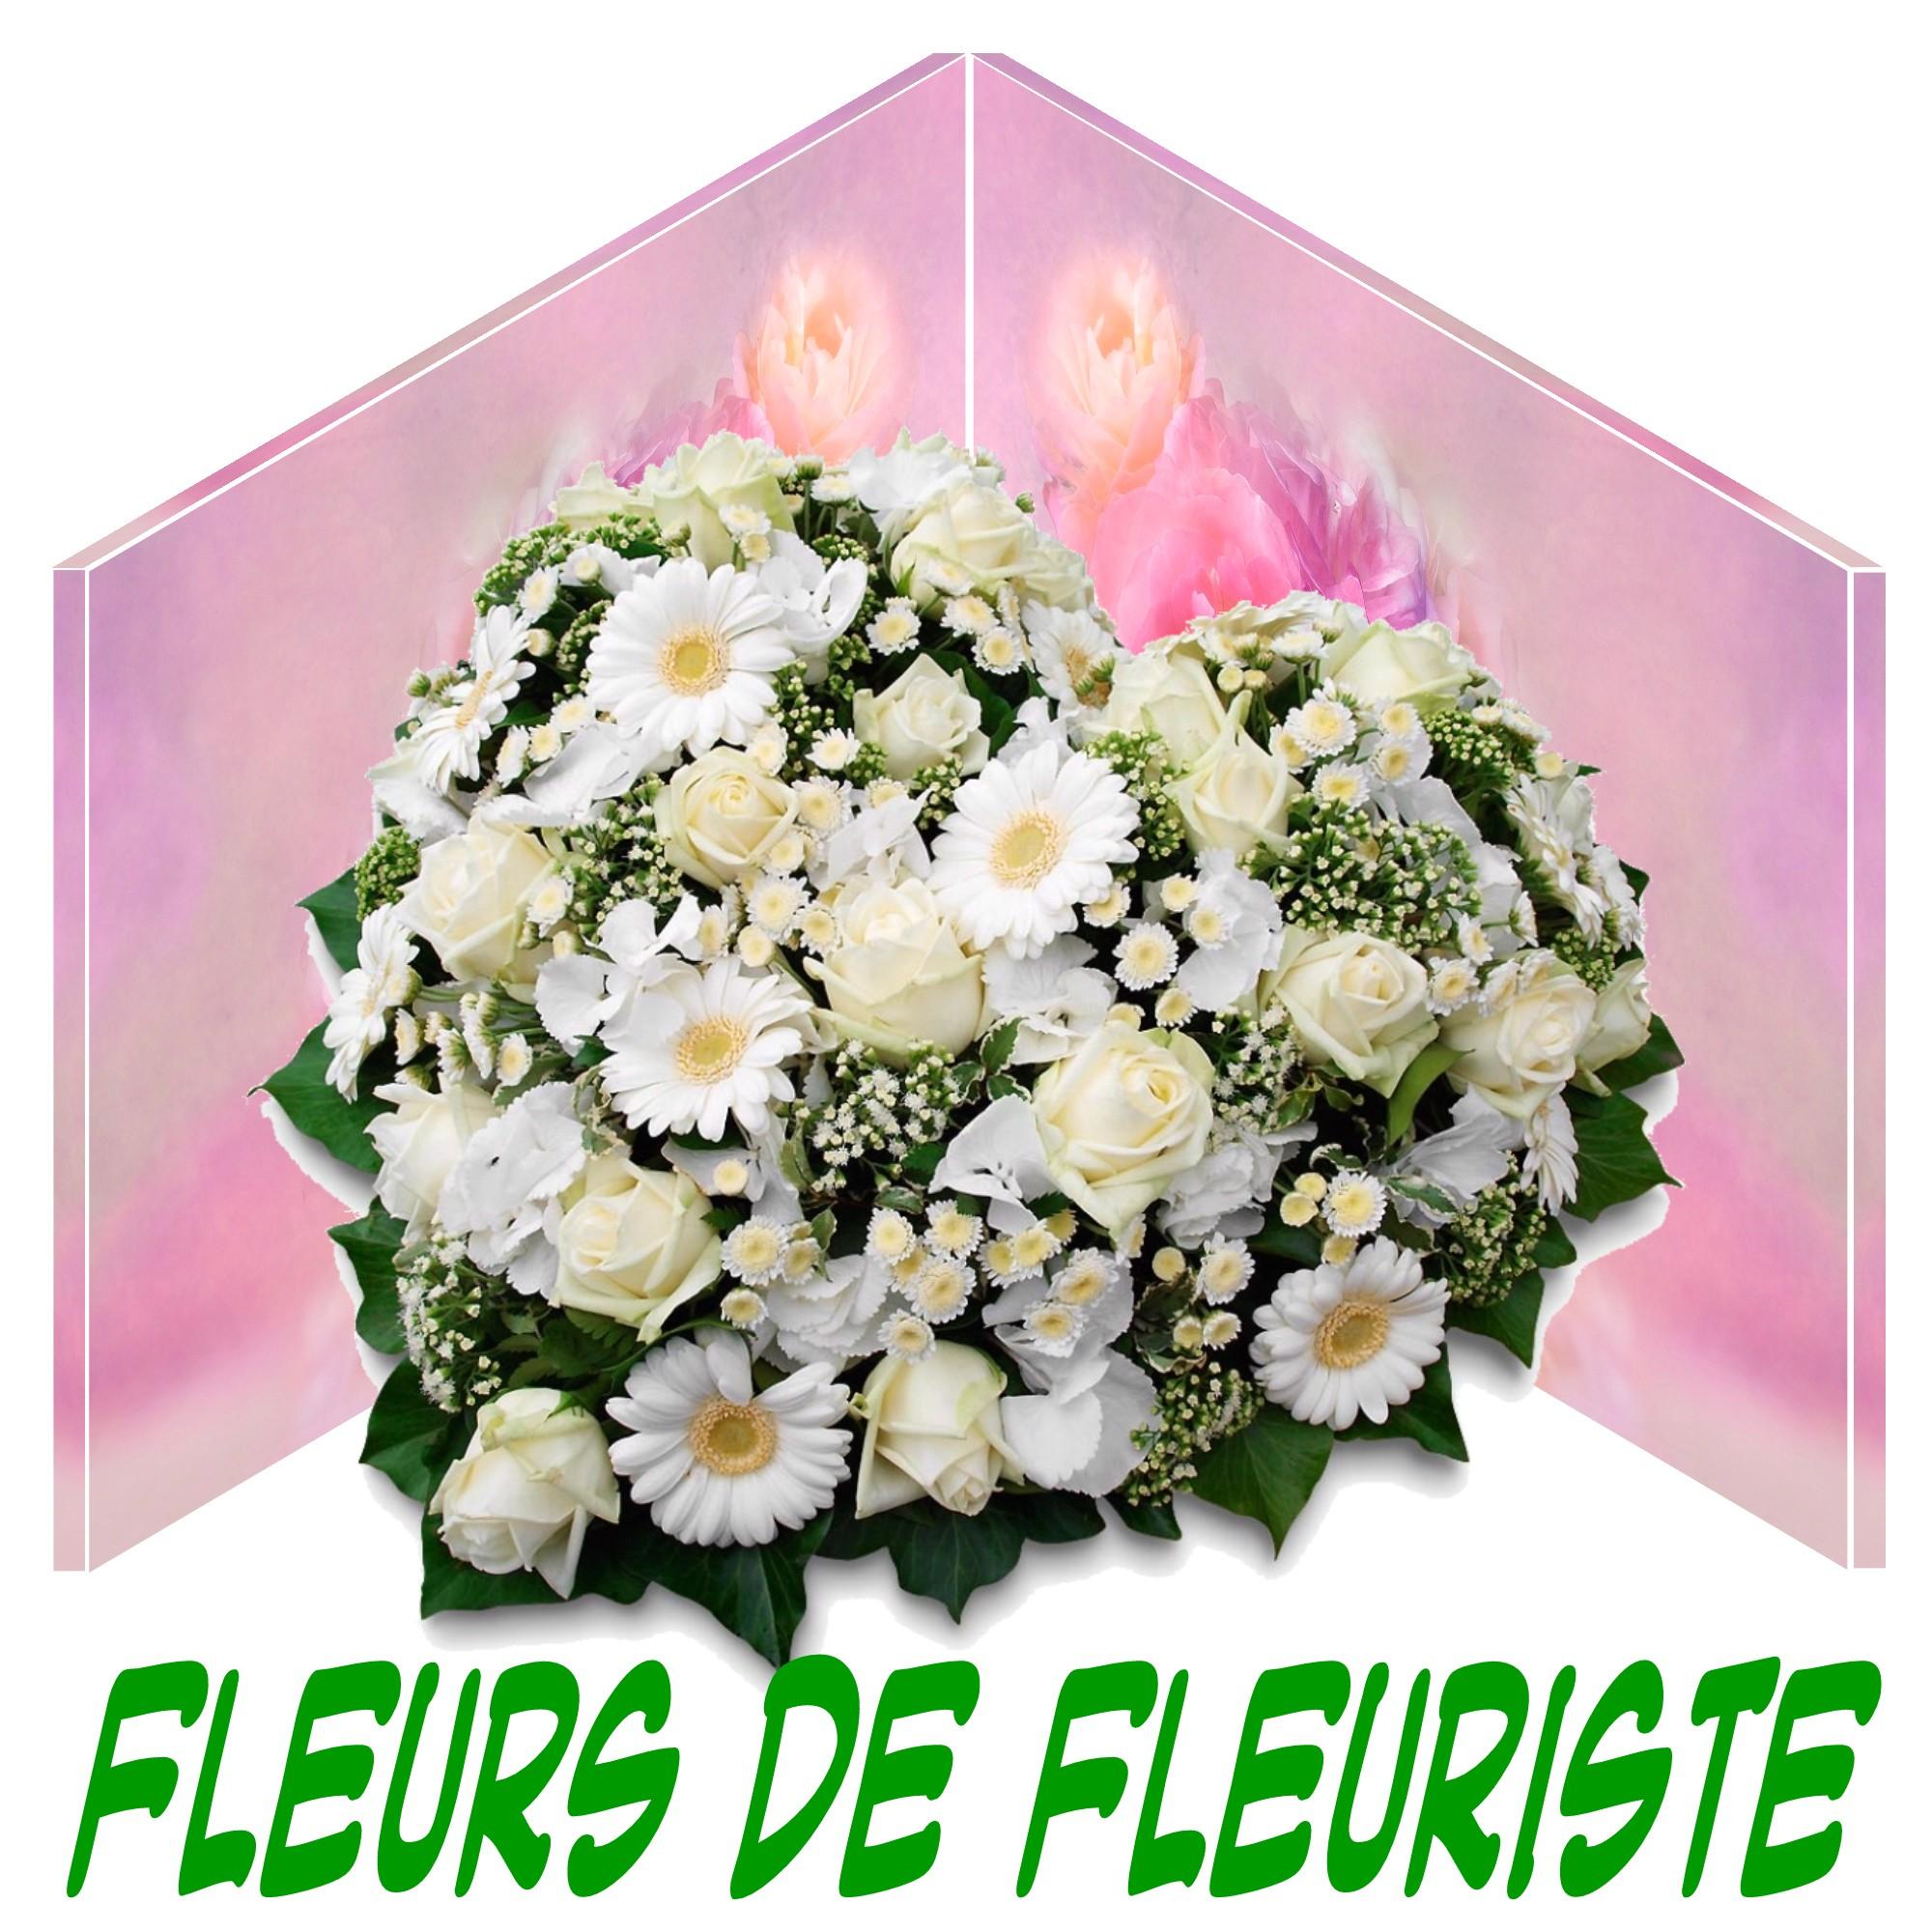 deuil - fleurs deuil - Livraison fleurs deuil - Faire livrer fleurs deuil - Envoyer fleurs deuil